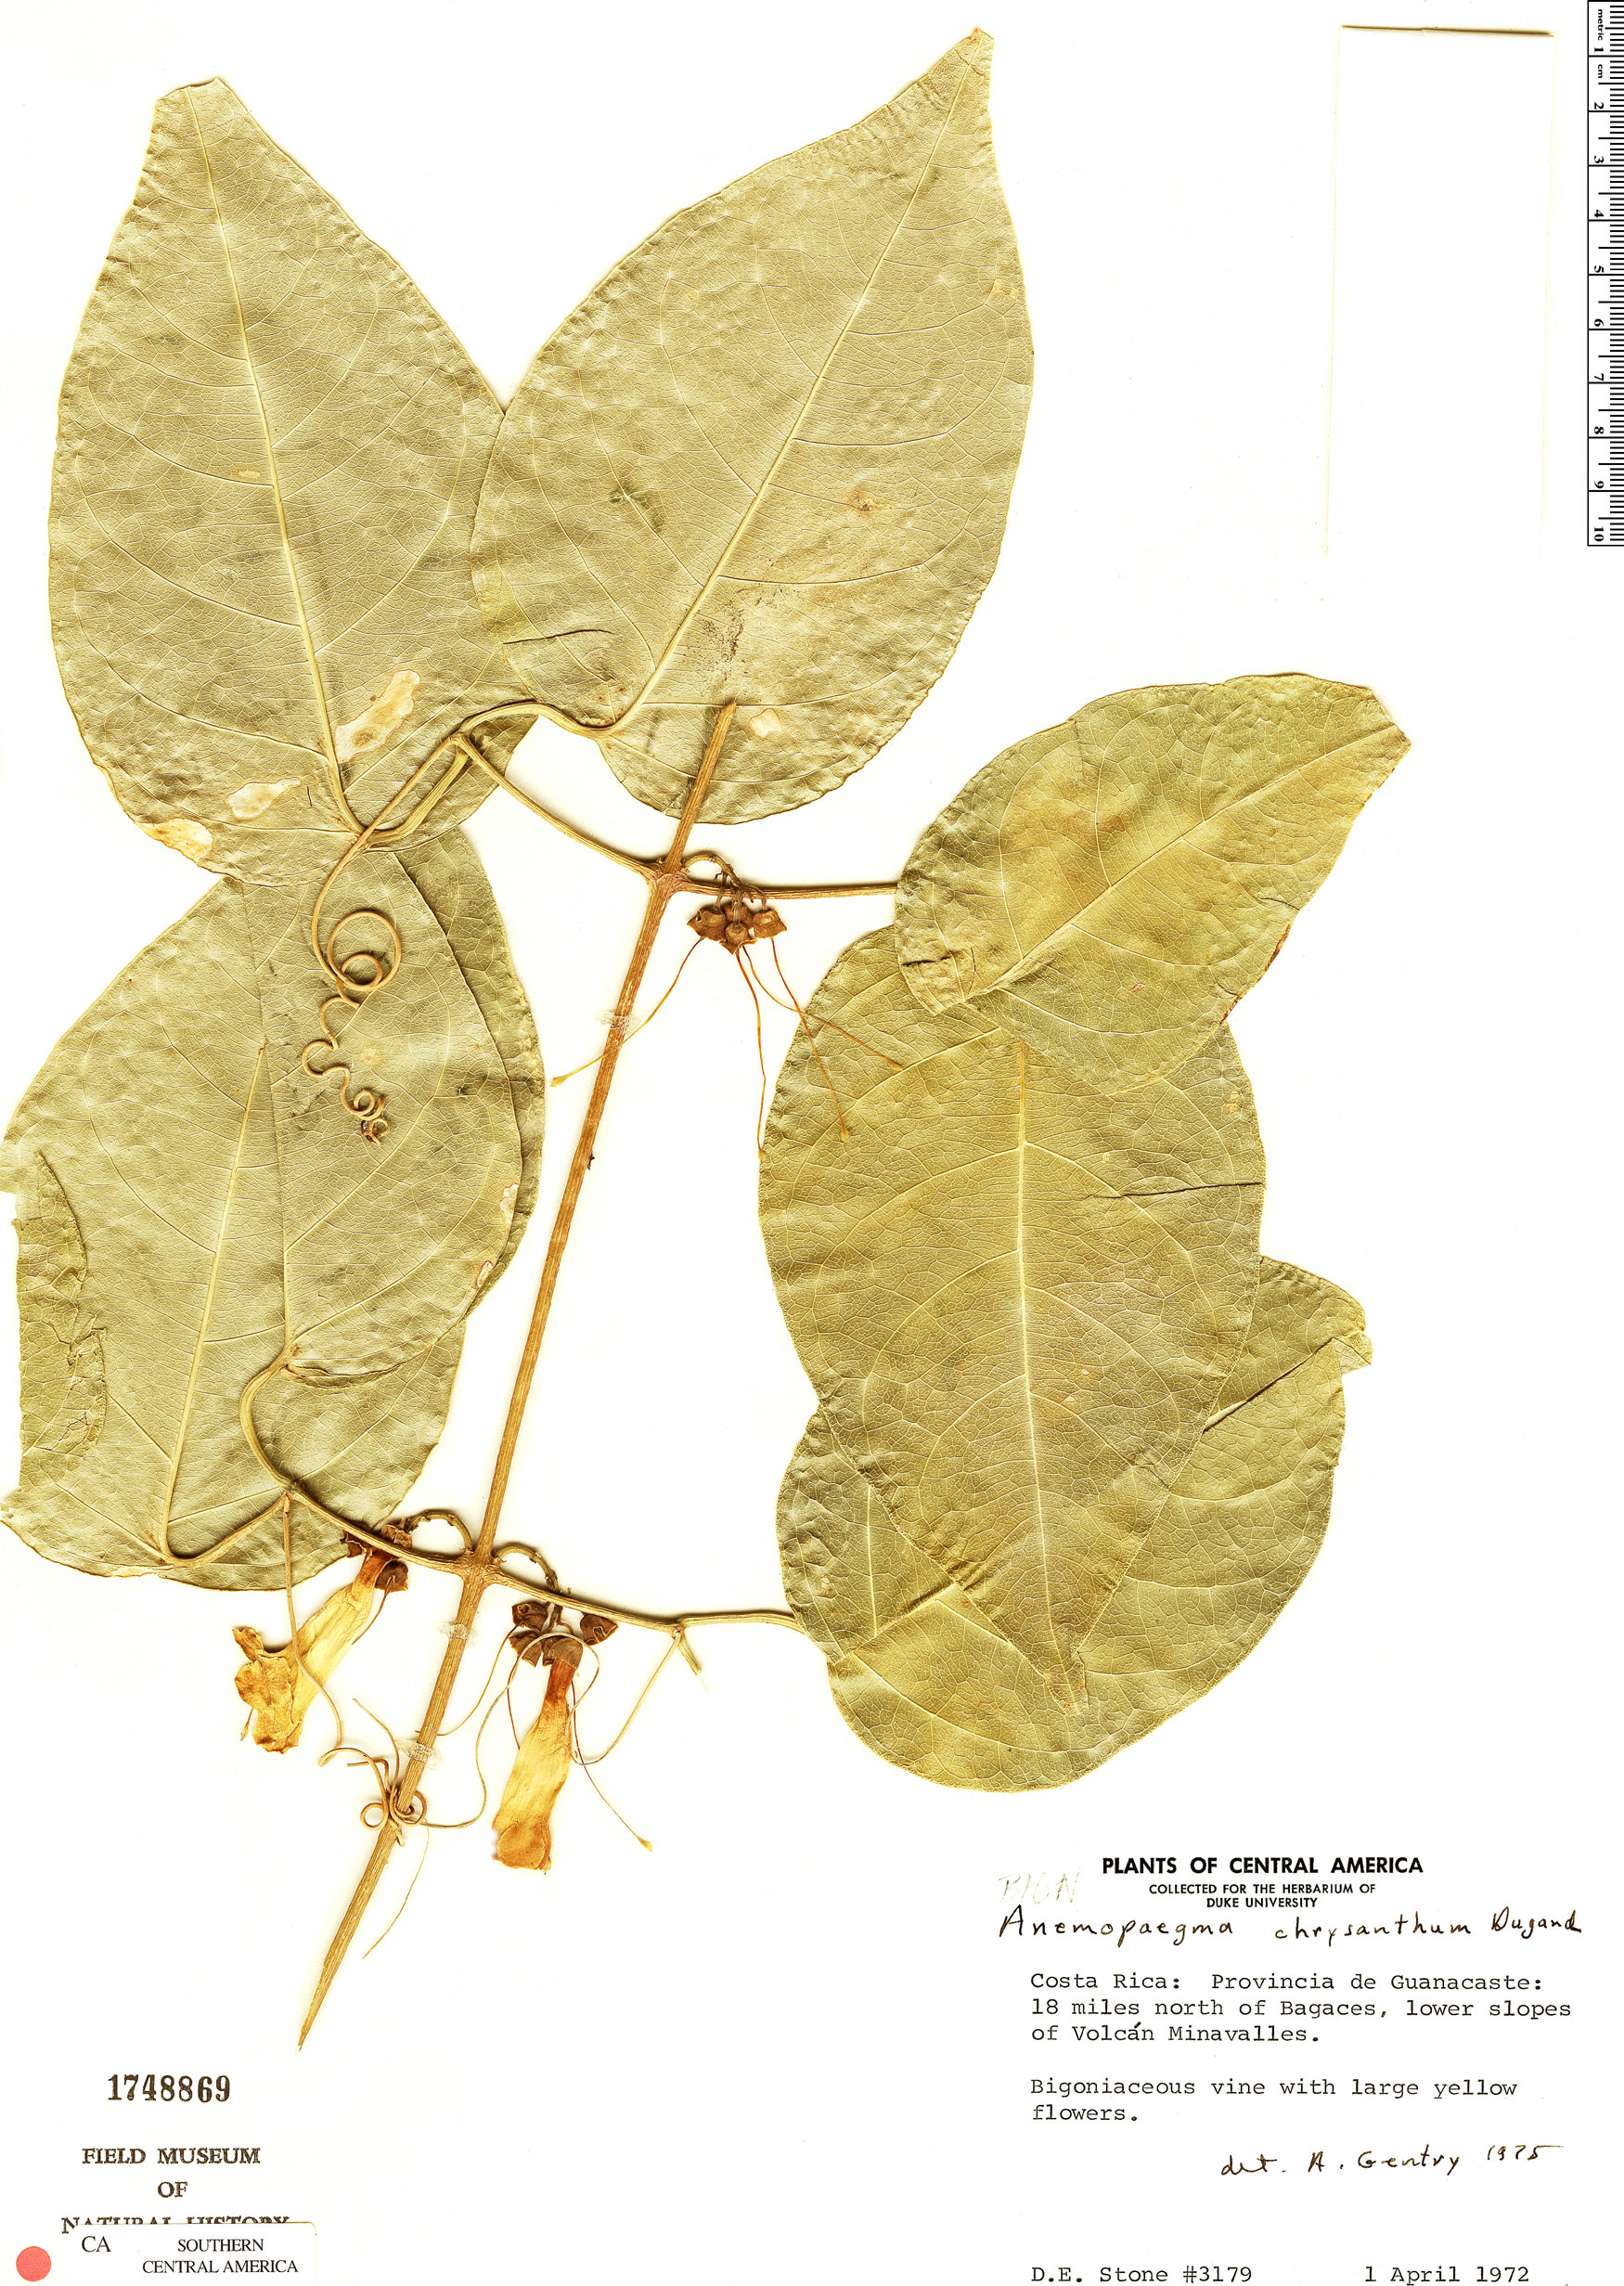 Specimen: Anemopaegma chrysanthum